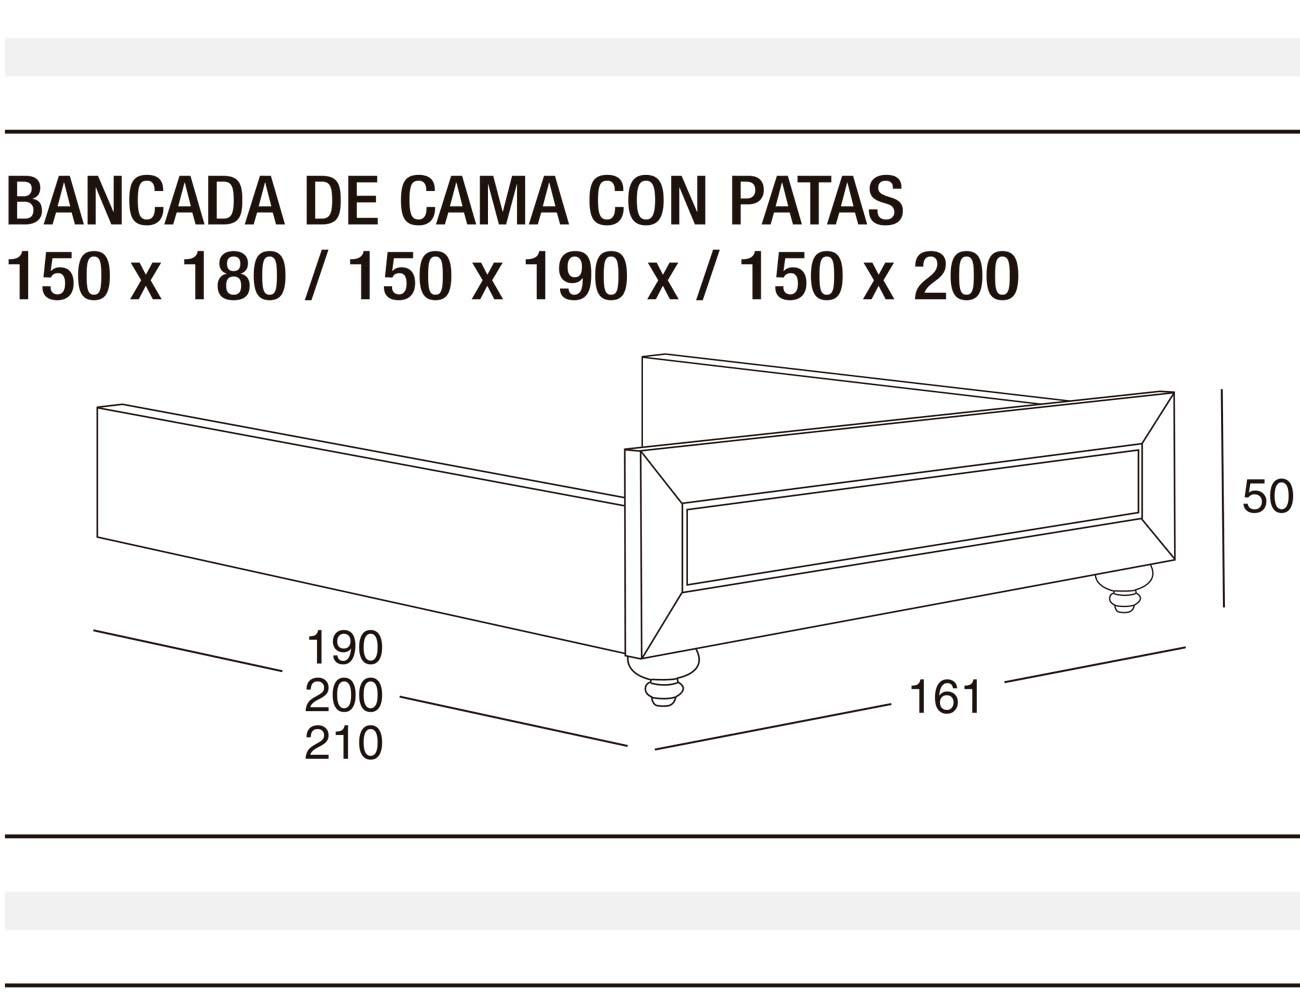 Bancada cama p 150x180 150x190 150x2001